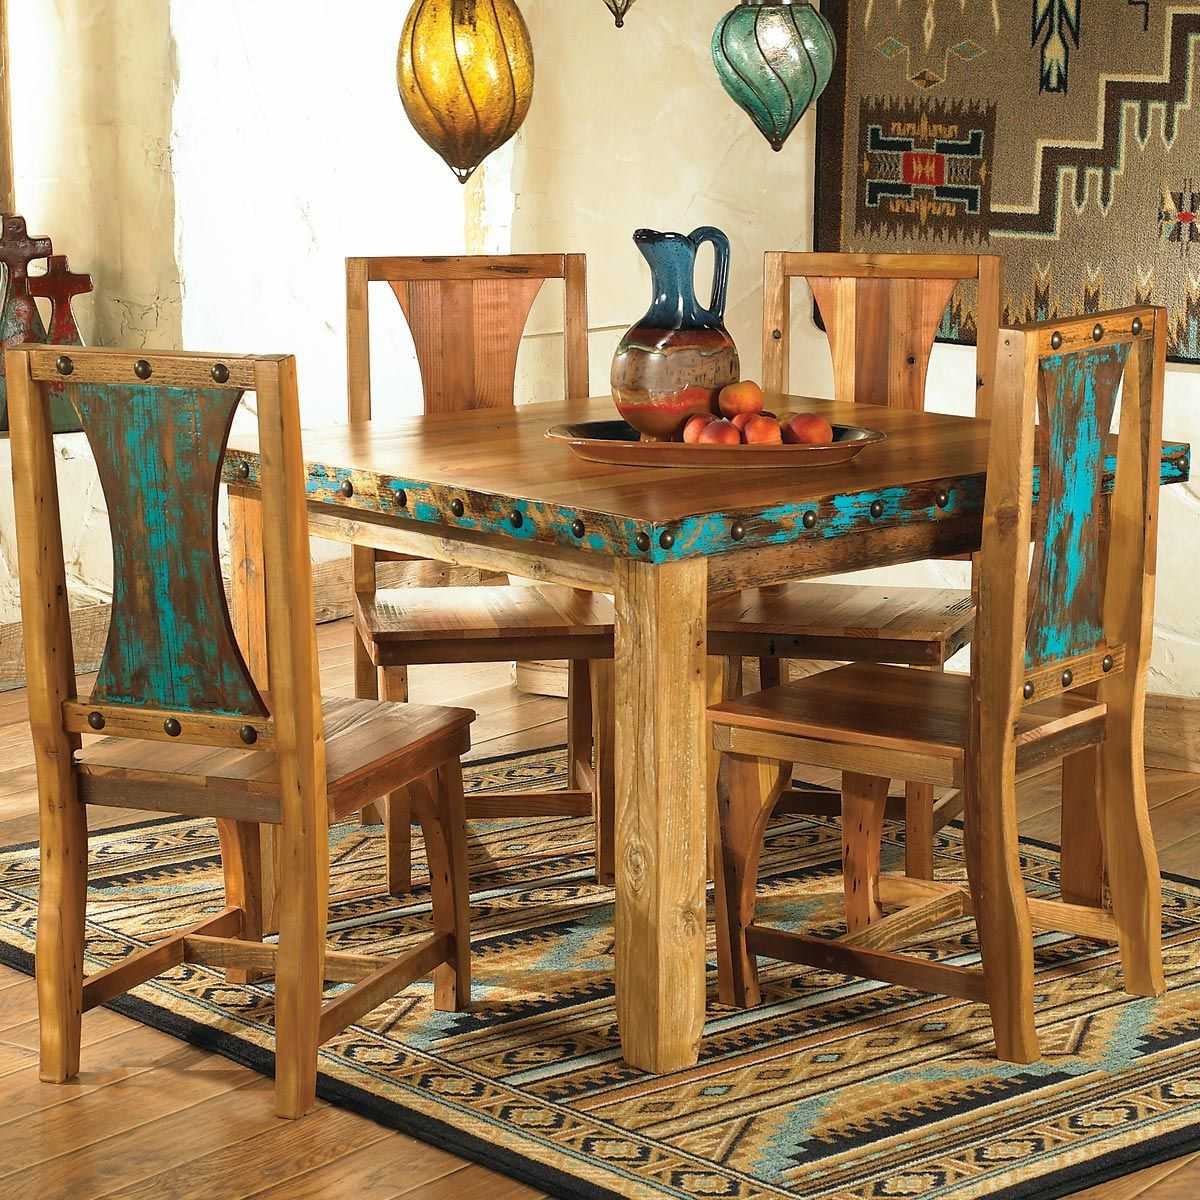 Rustic Western Dining Room Chairs | http://enricbataller.net ...